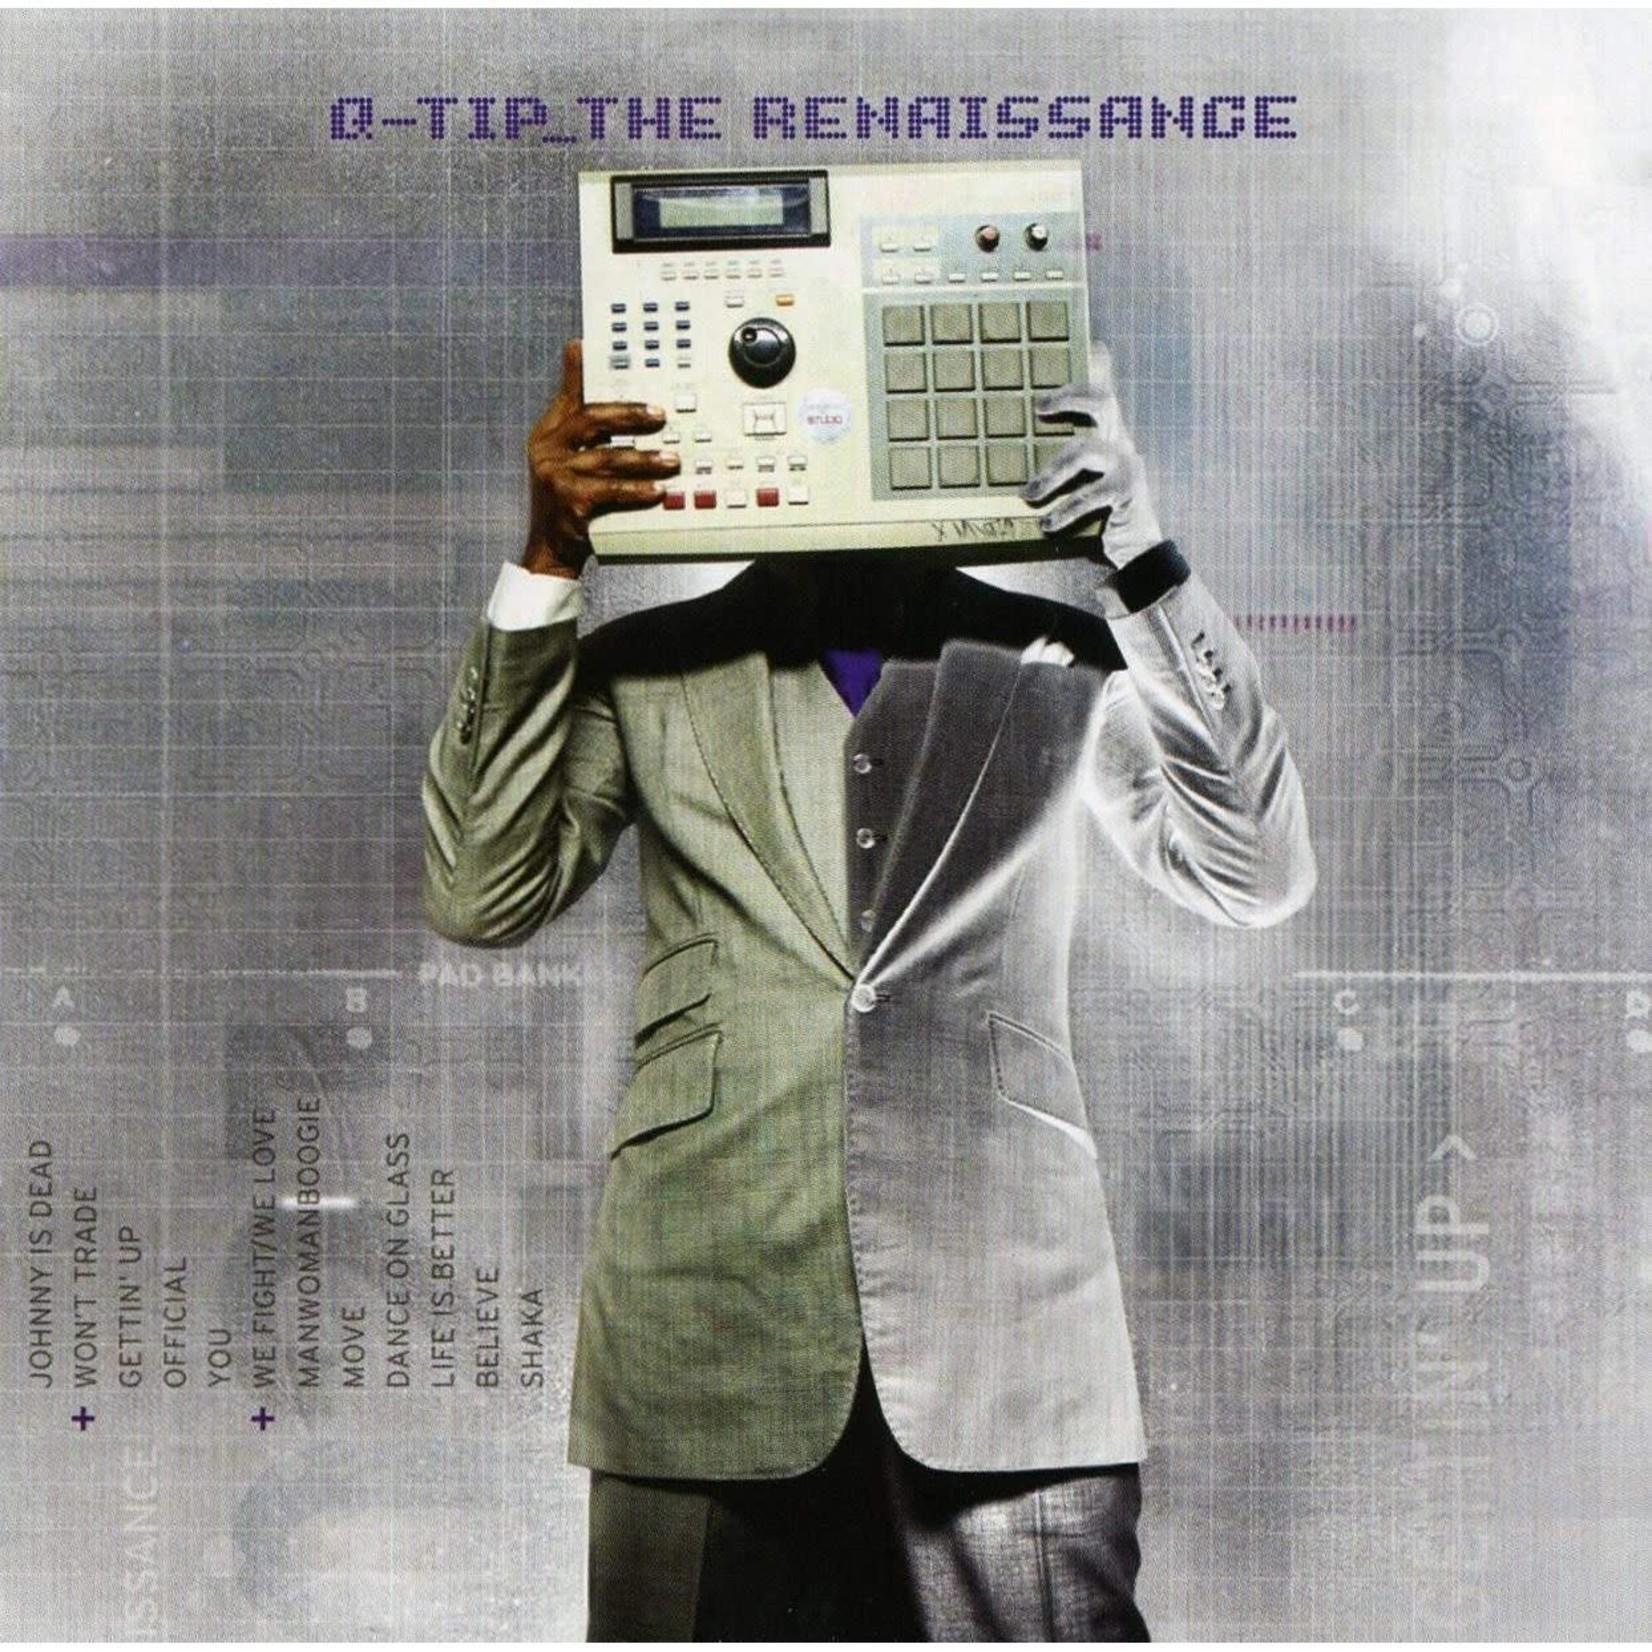 [New] Q-Tip (A Tribe Called Quest): The Renaissance (2LP)